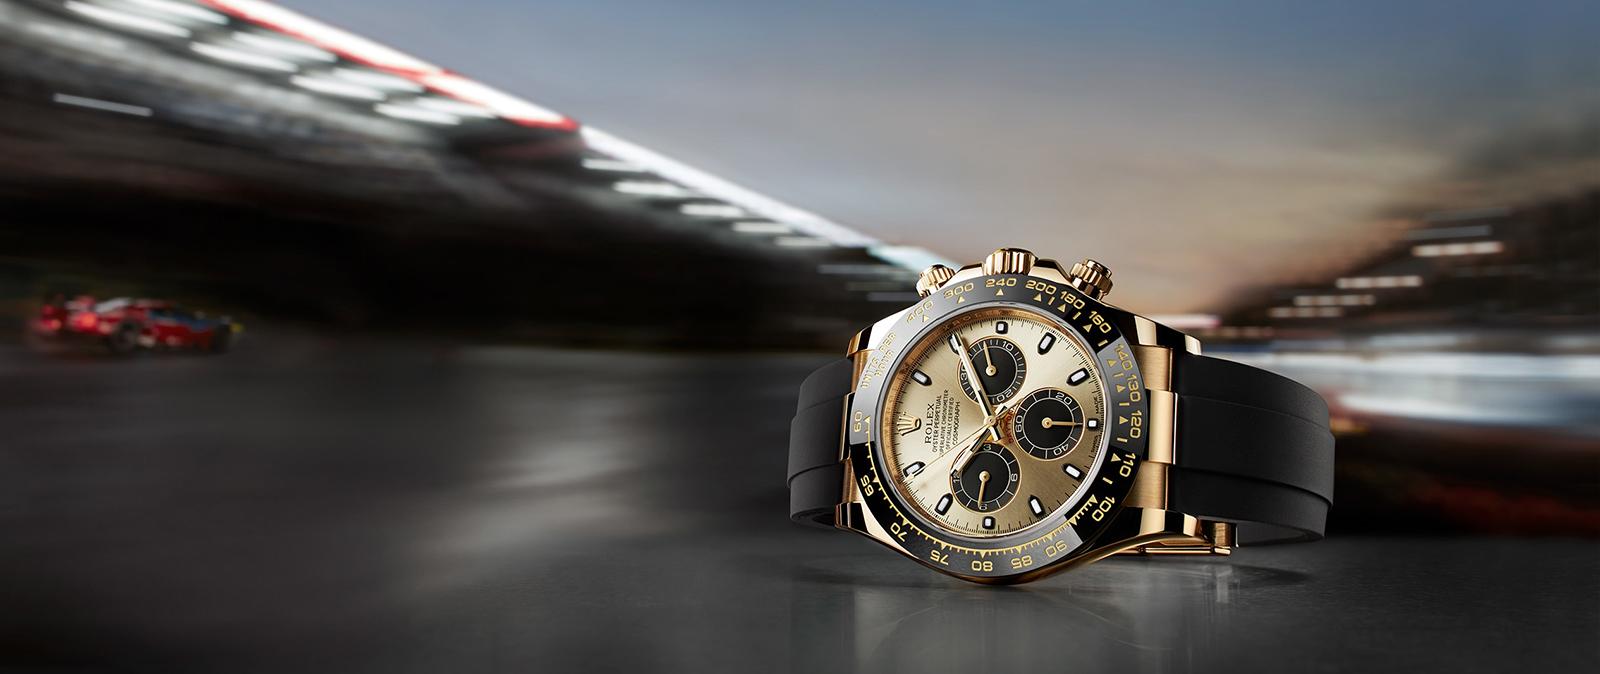 Rolex Yachtmaster - Sergio Capone Pisa